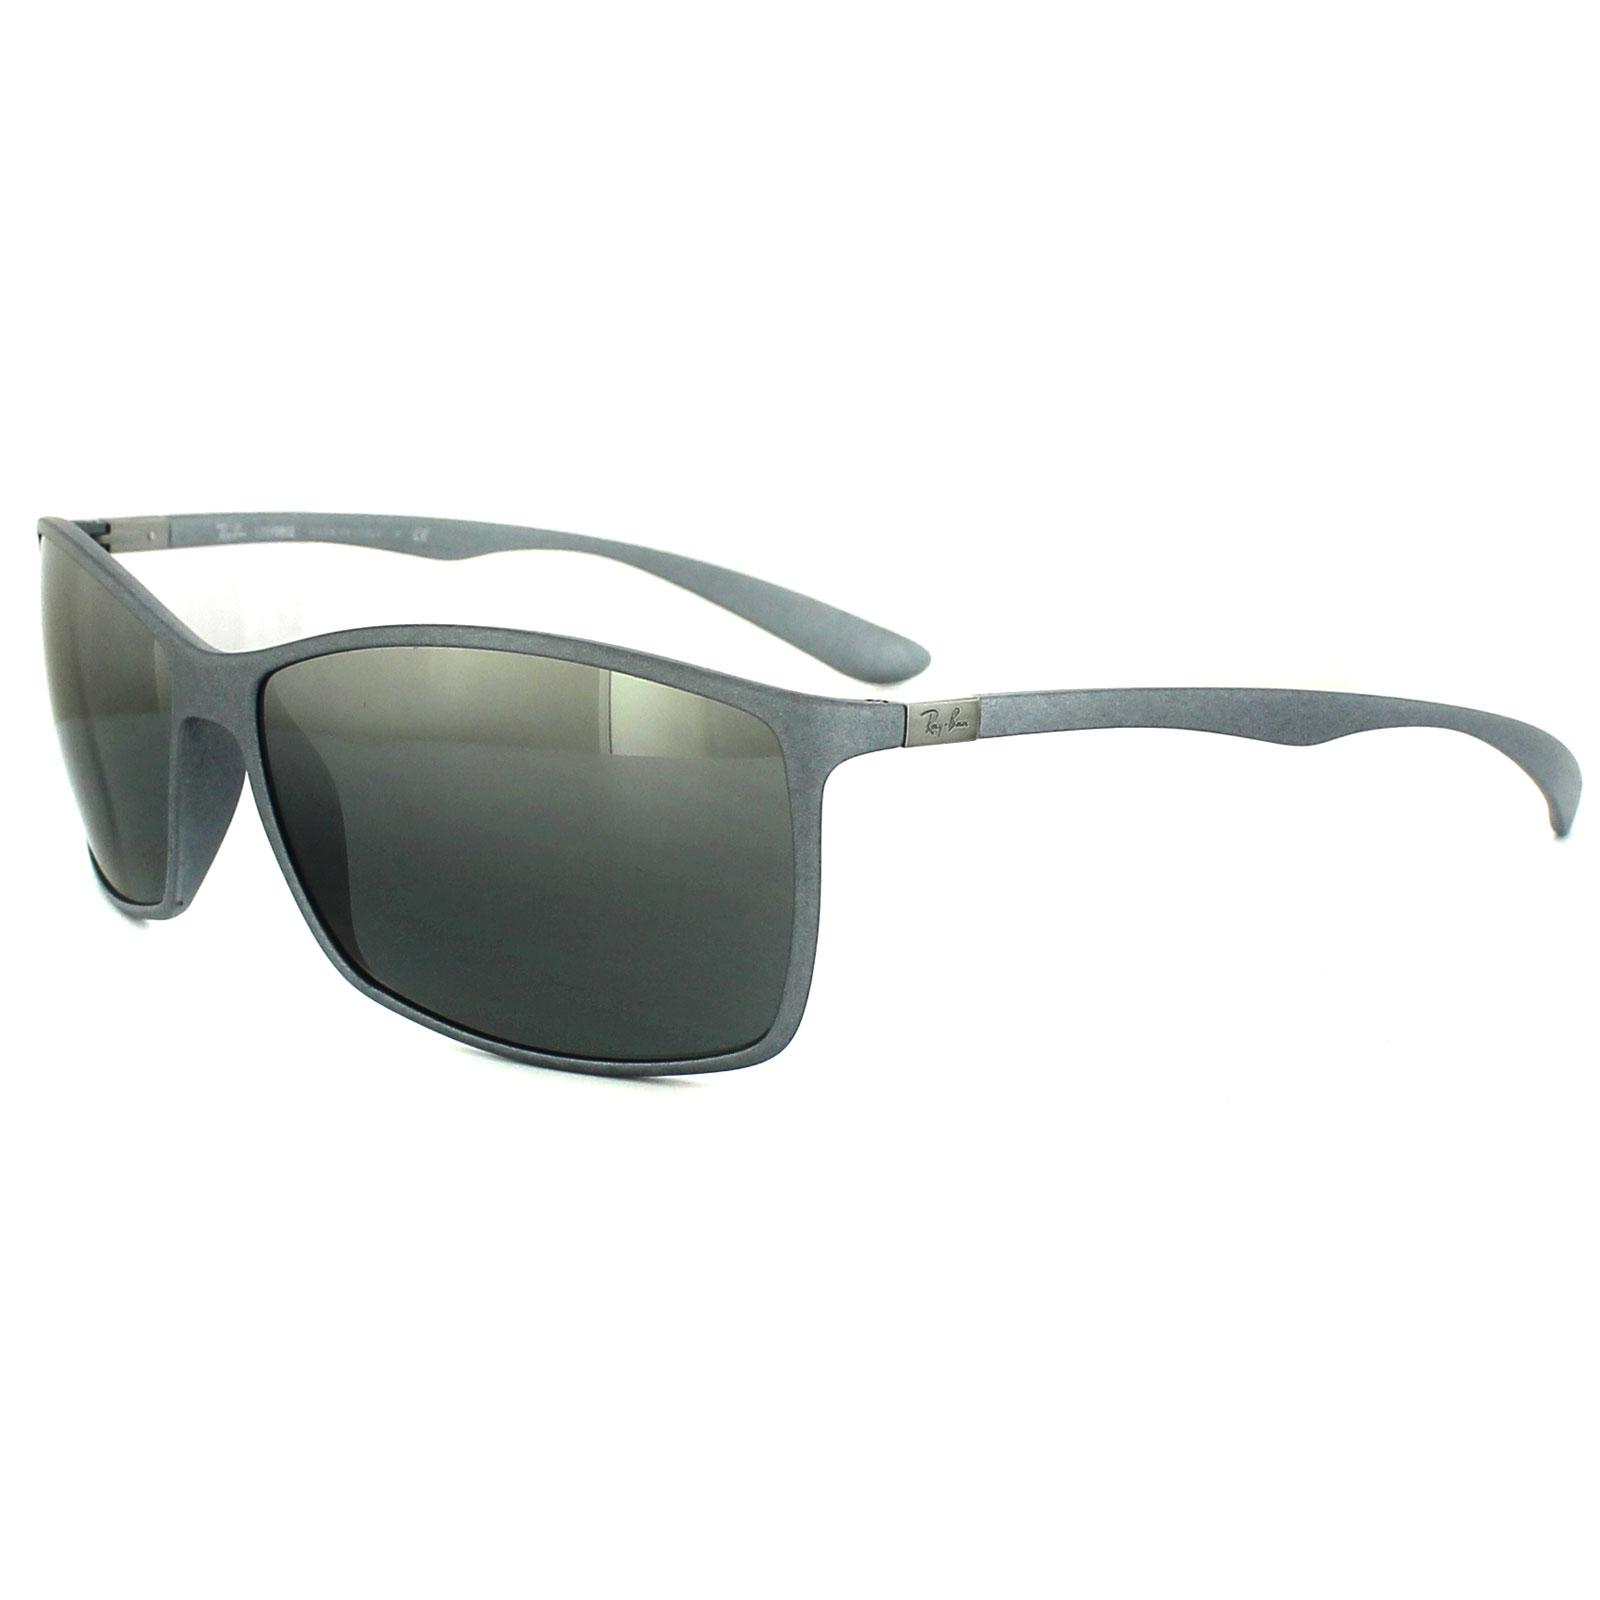 94376e02c3 Cheap Ray-Ban 4179 Sunglasses - Discounted Sunglasses